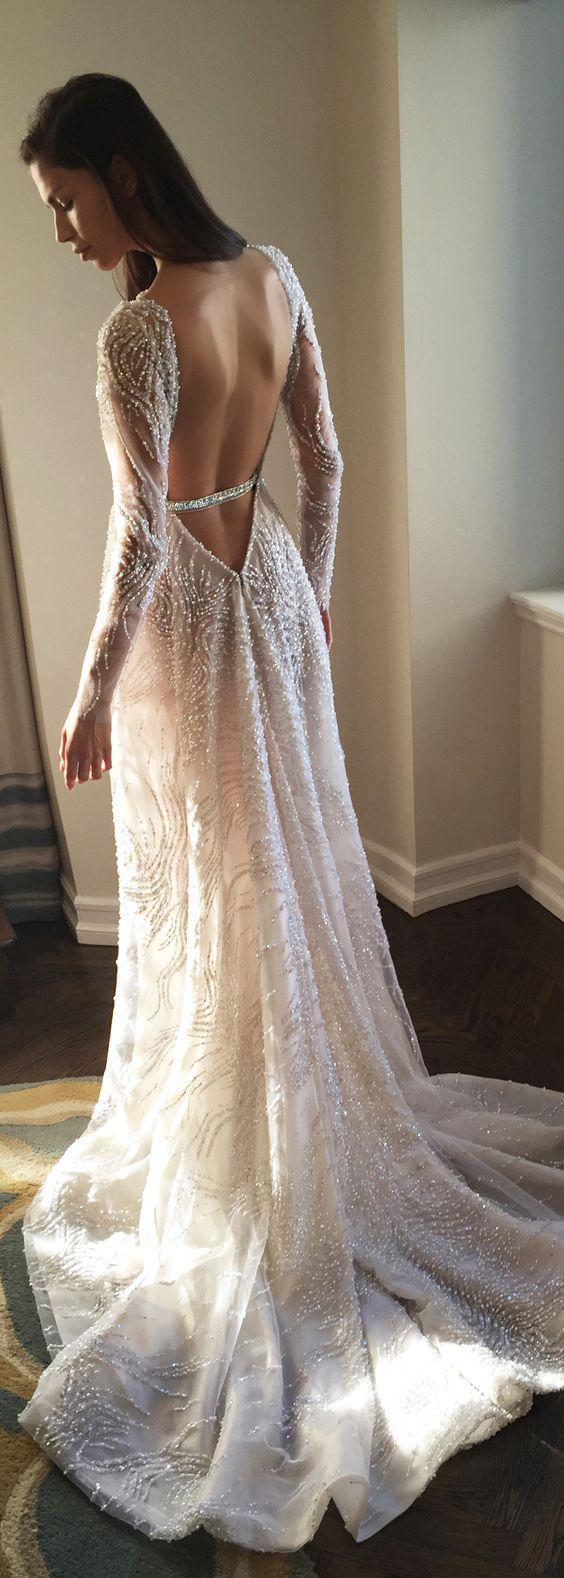 Unique longsleeve bare back wedding dress wedding dresses